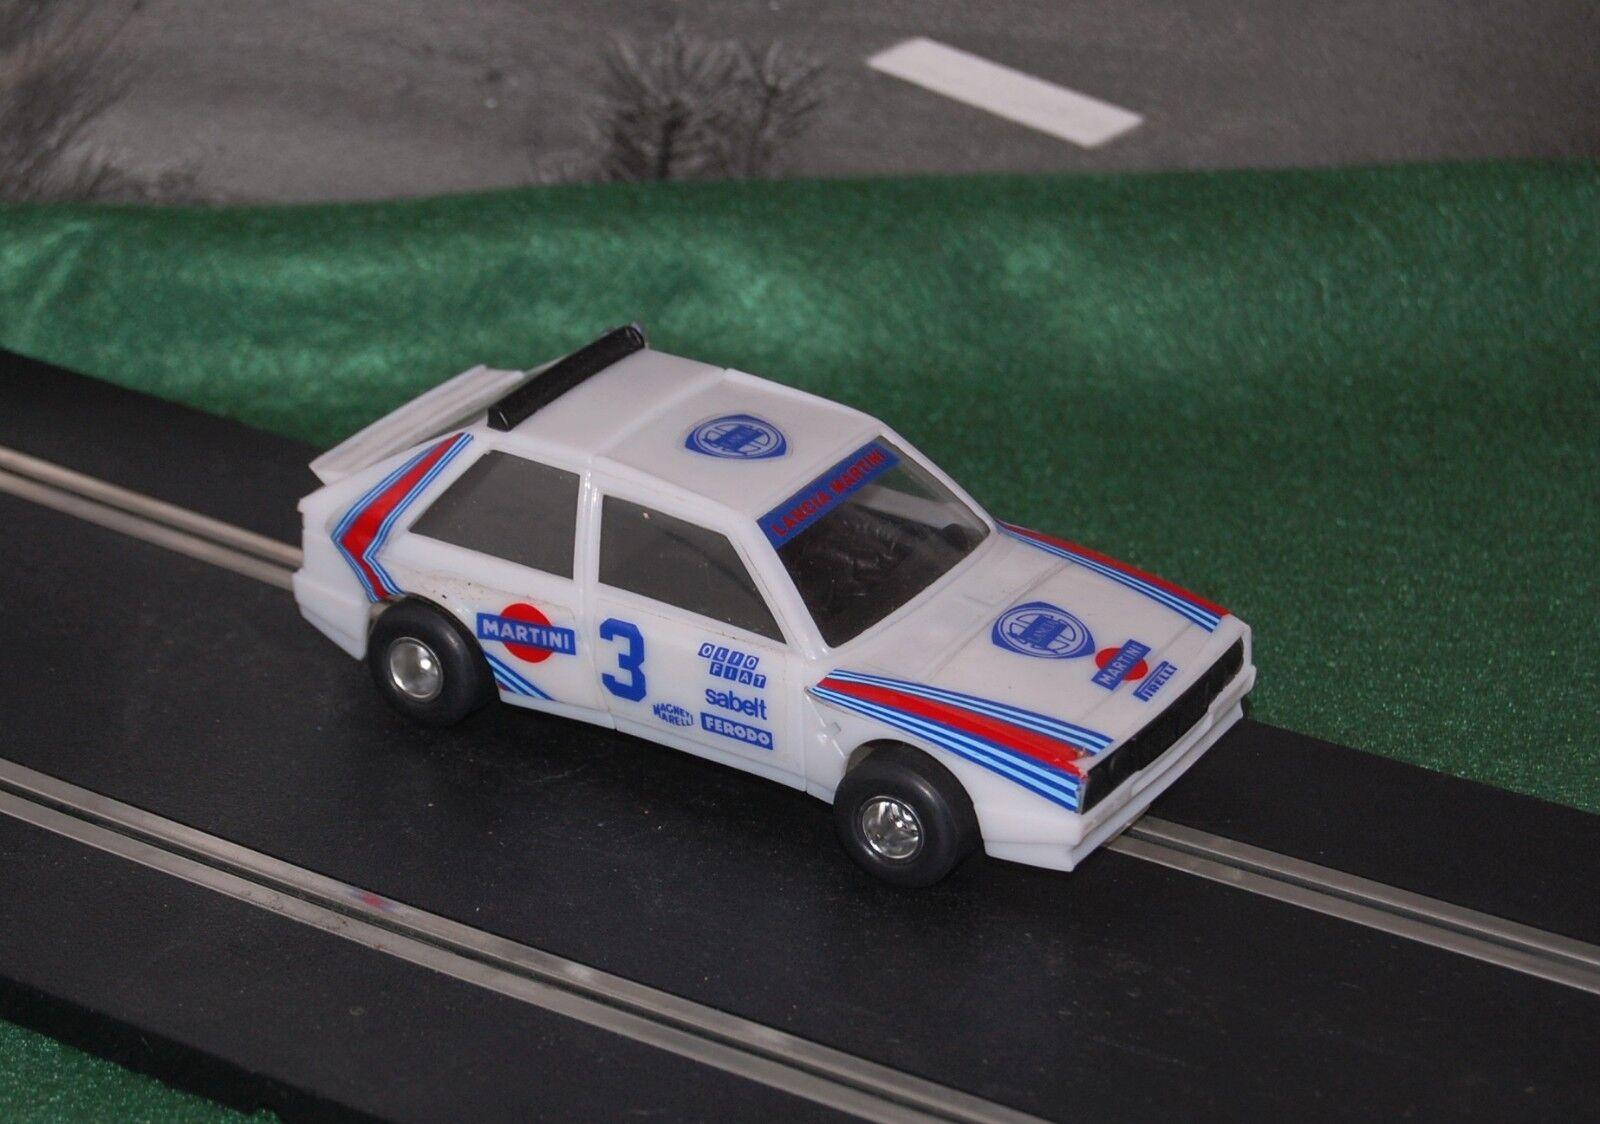 Polistil Lancia Delta S4 Rally 1 32 Slot Car Rare 1980s Free UK P&P